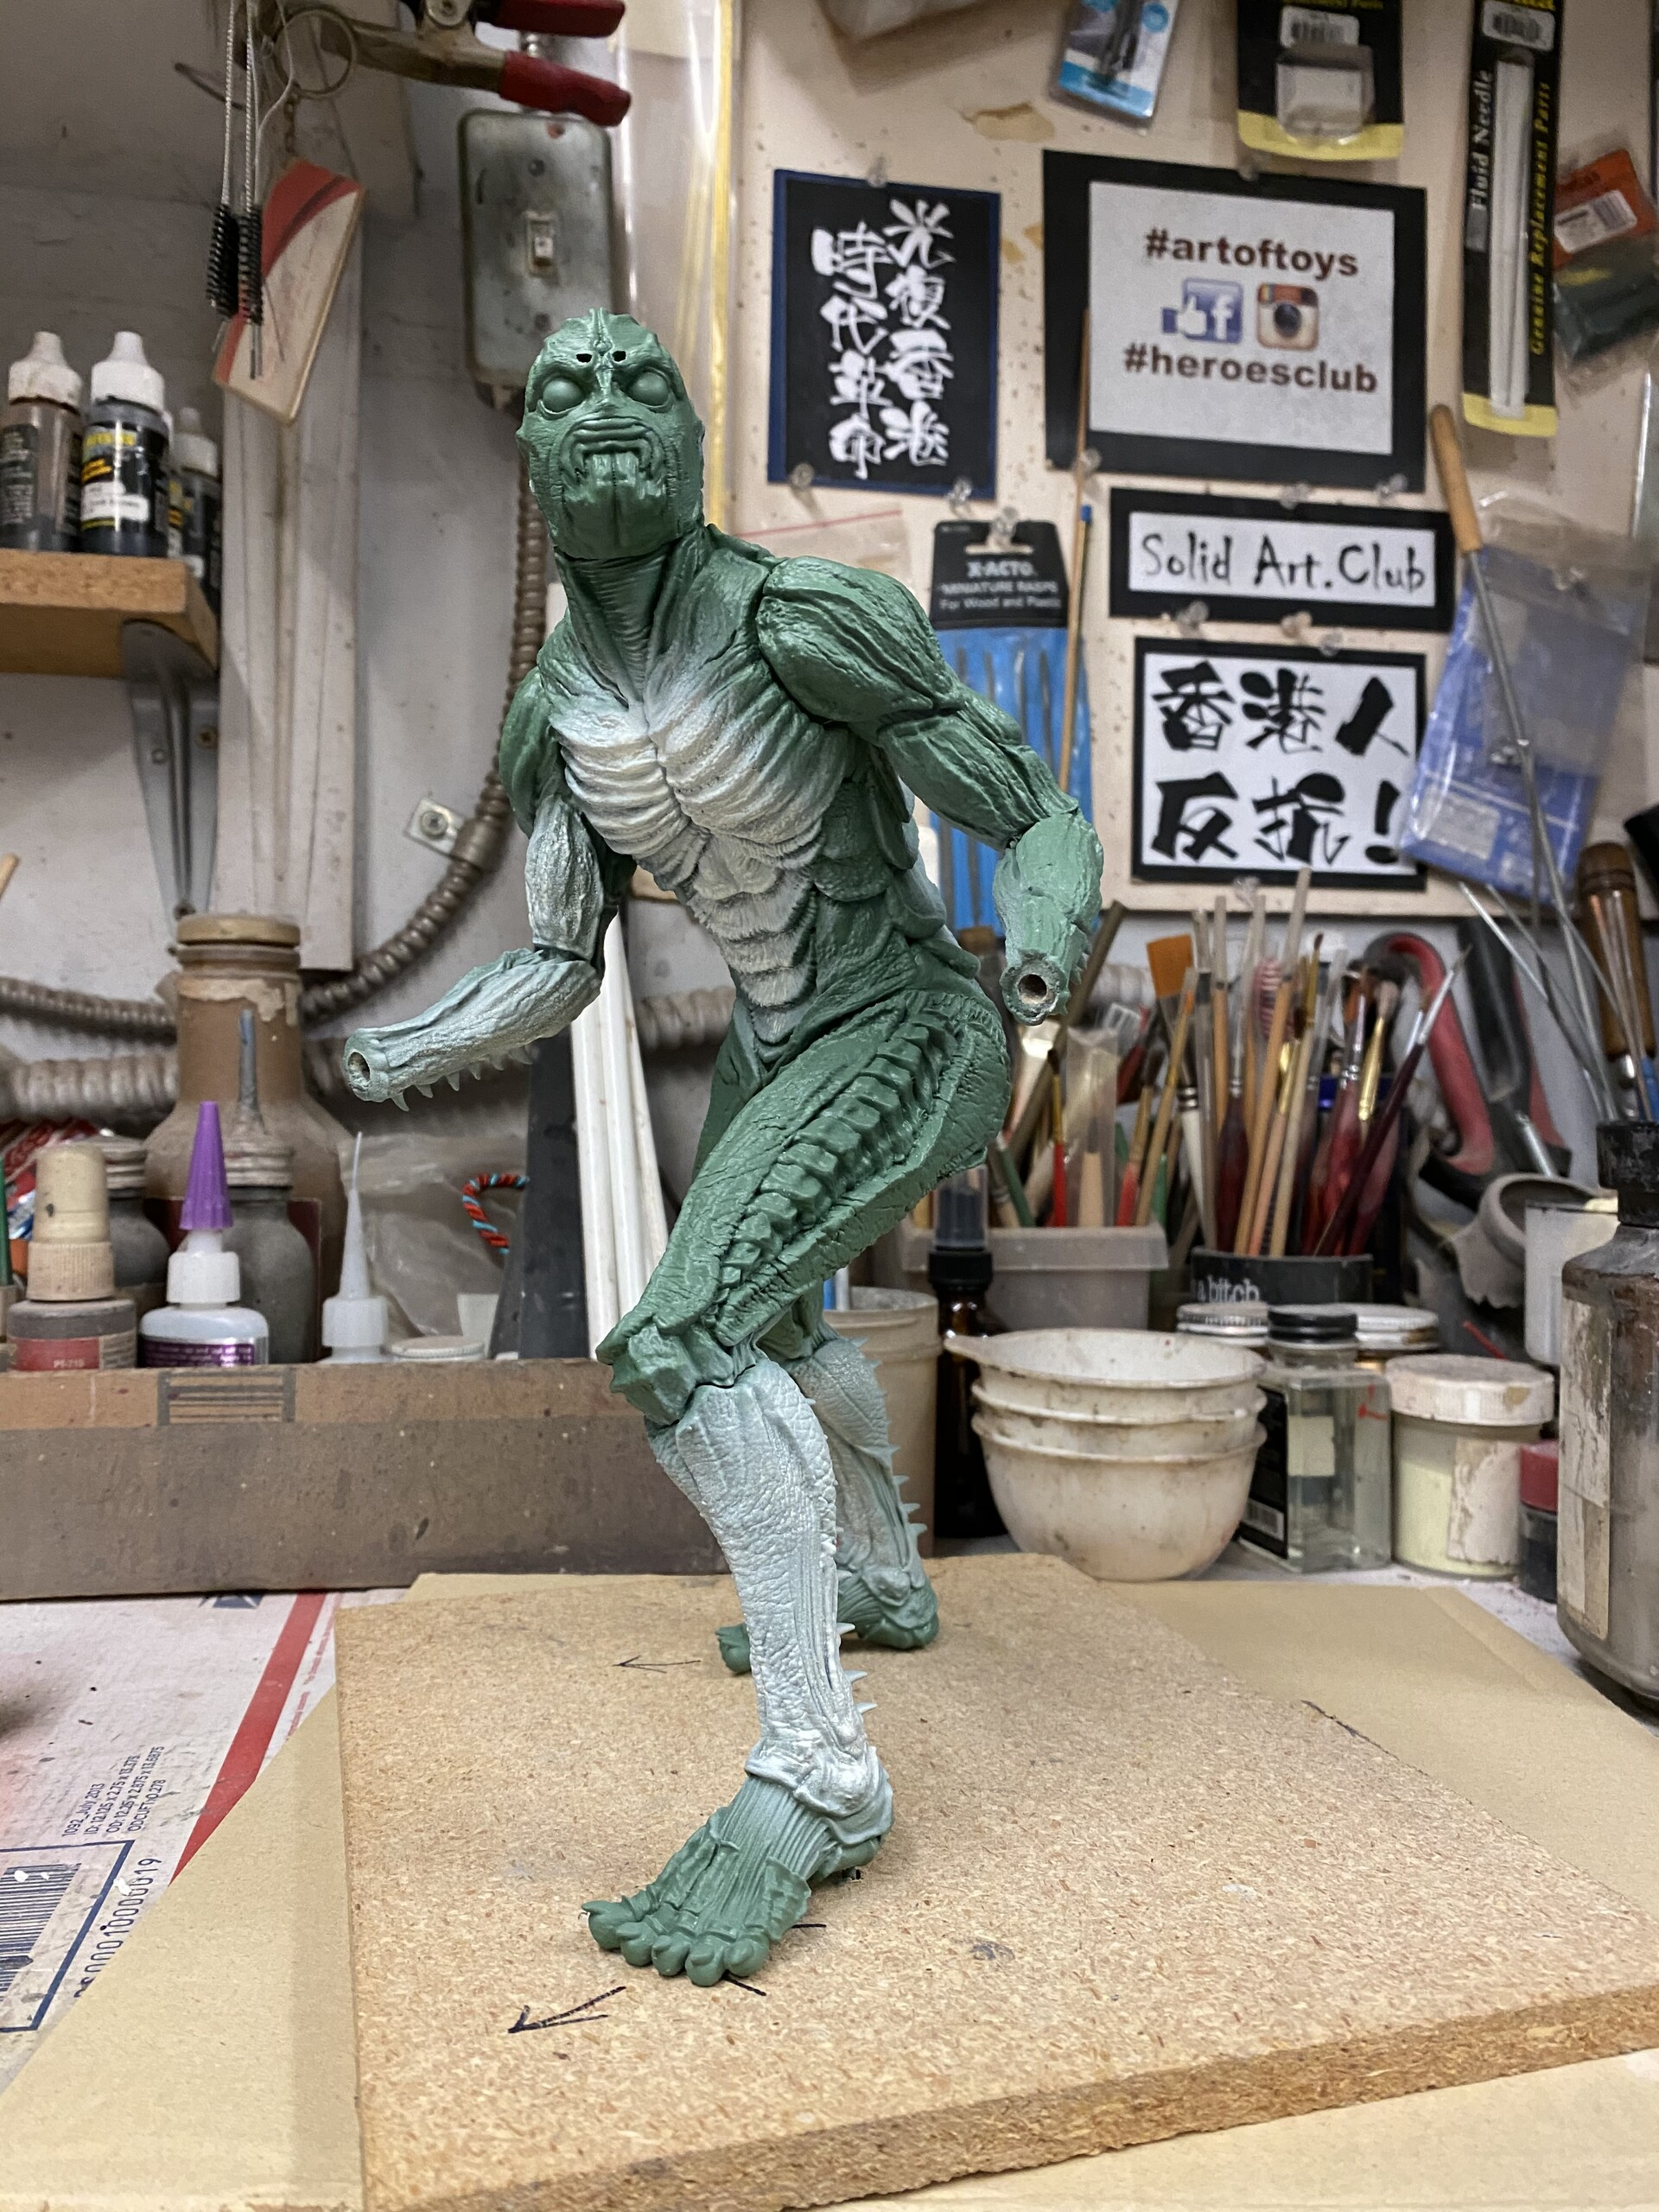 W.I.P. 真・仮面ライダー  Shin Kamen Rider 1:6 scale Art Statue  https://www.solidart.club/